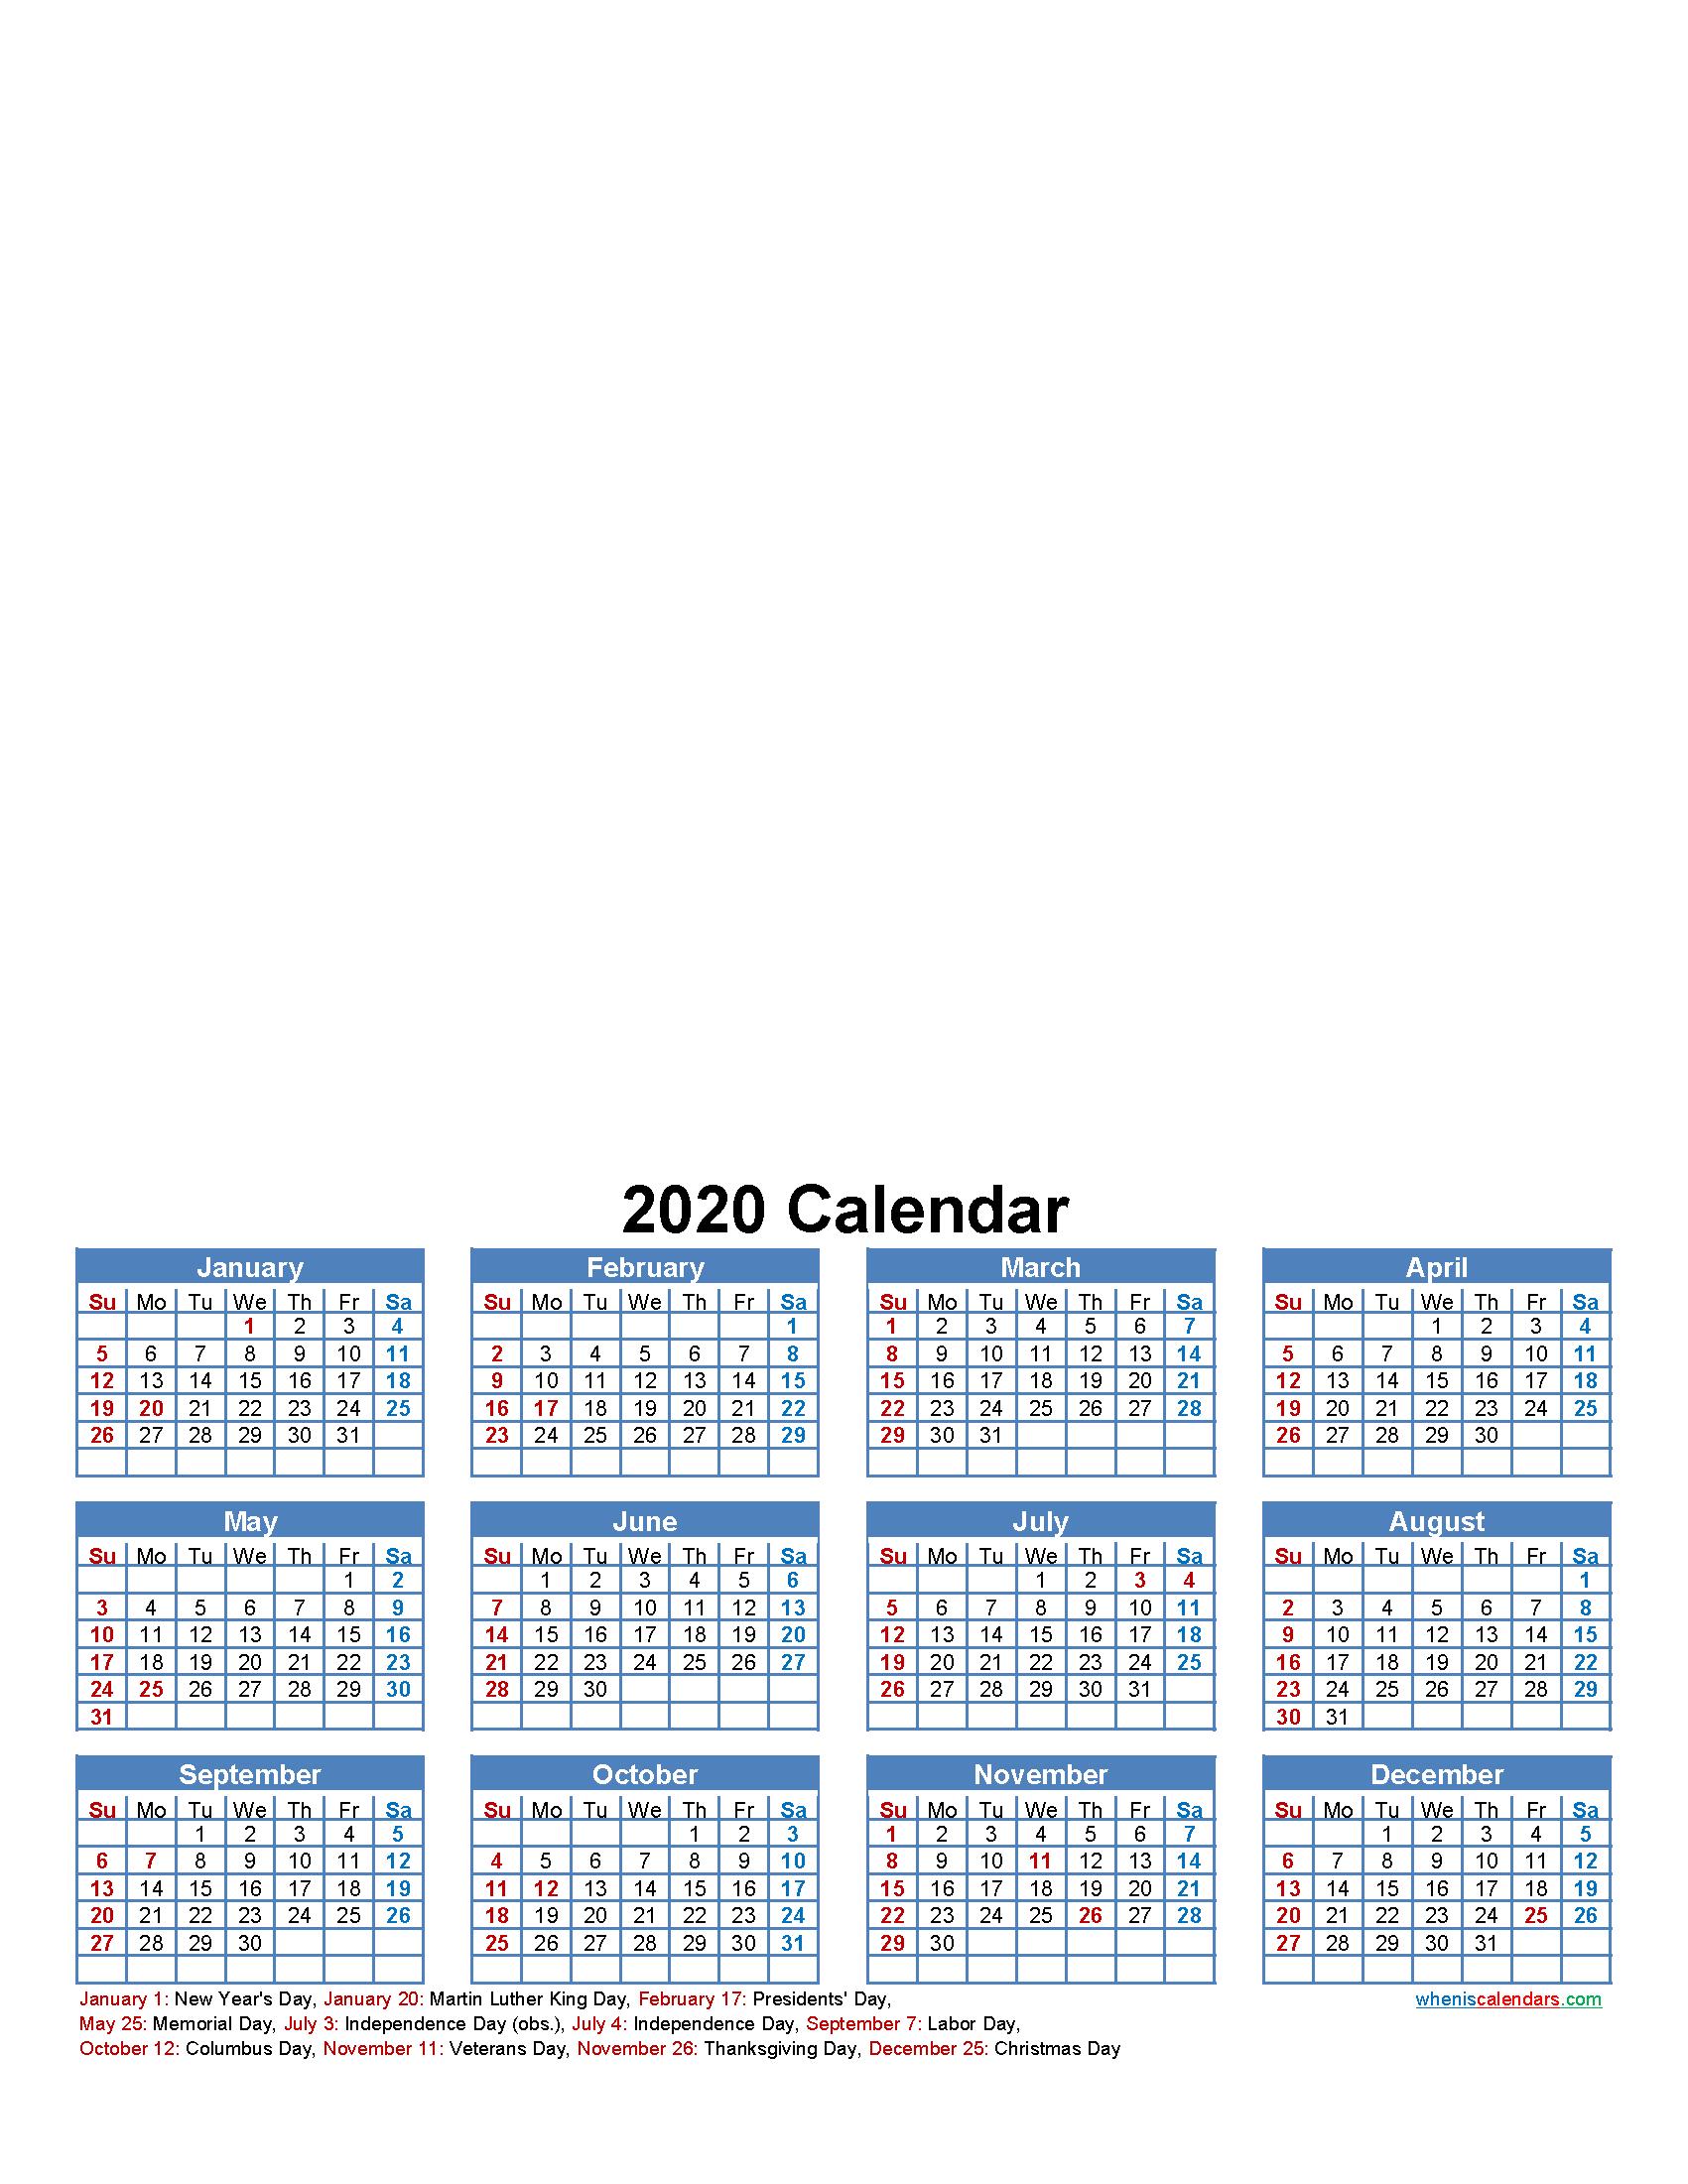 Custom Photo Calendar 2020 Word, PDF